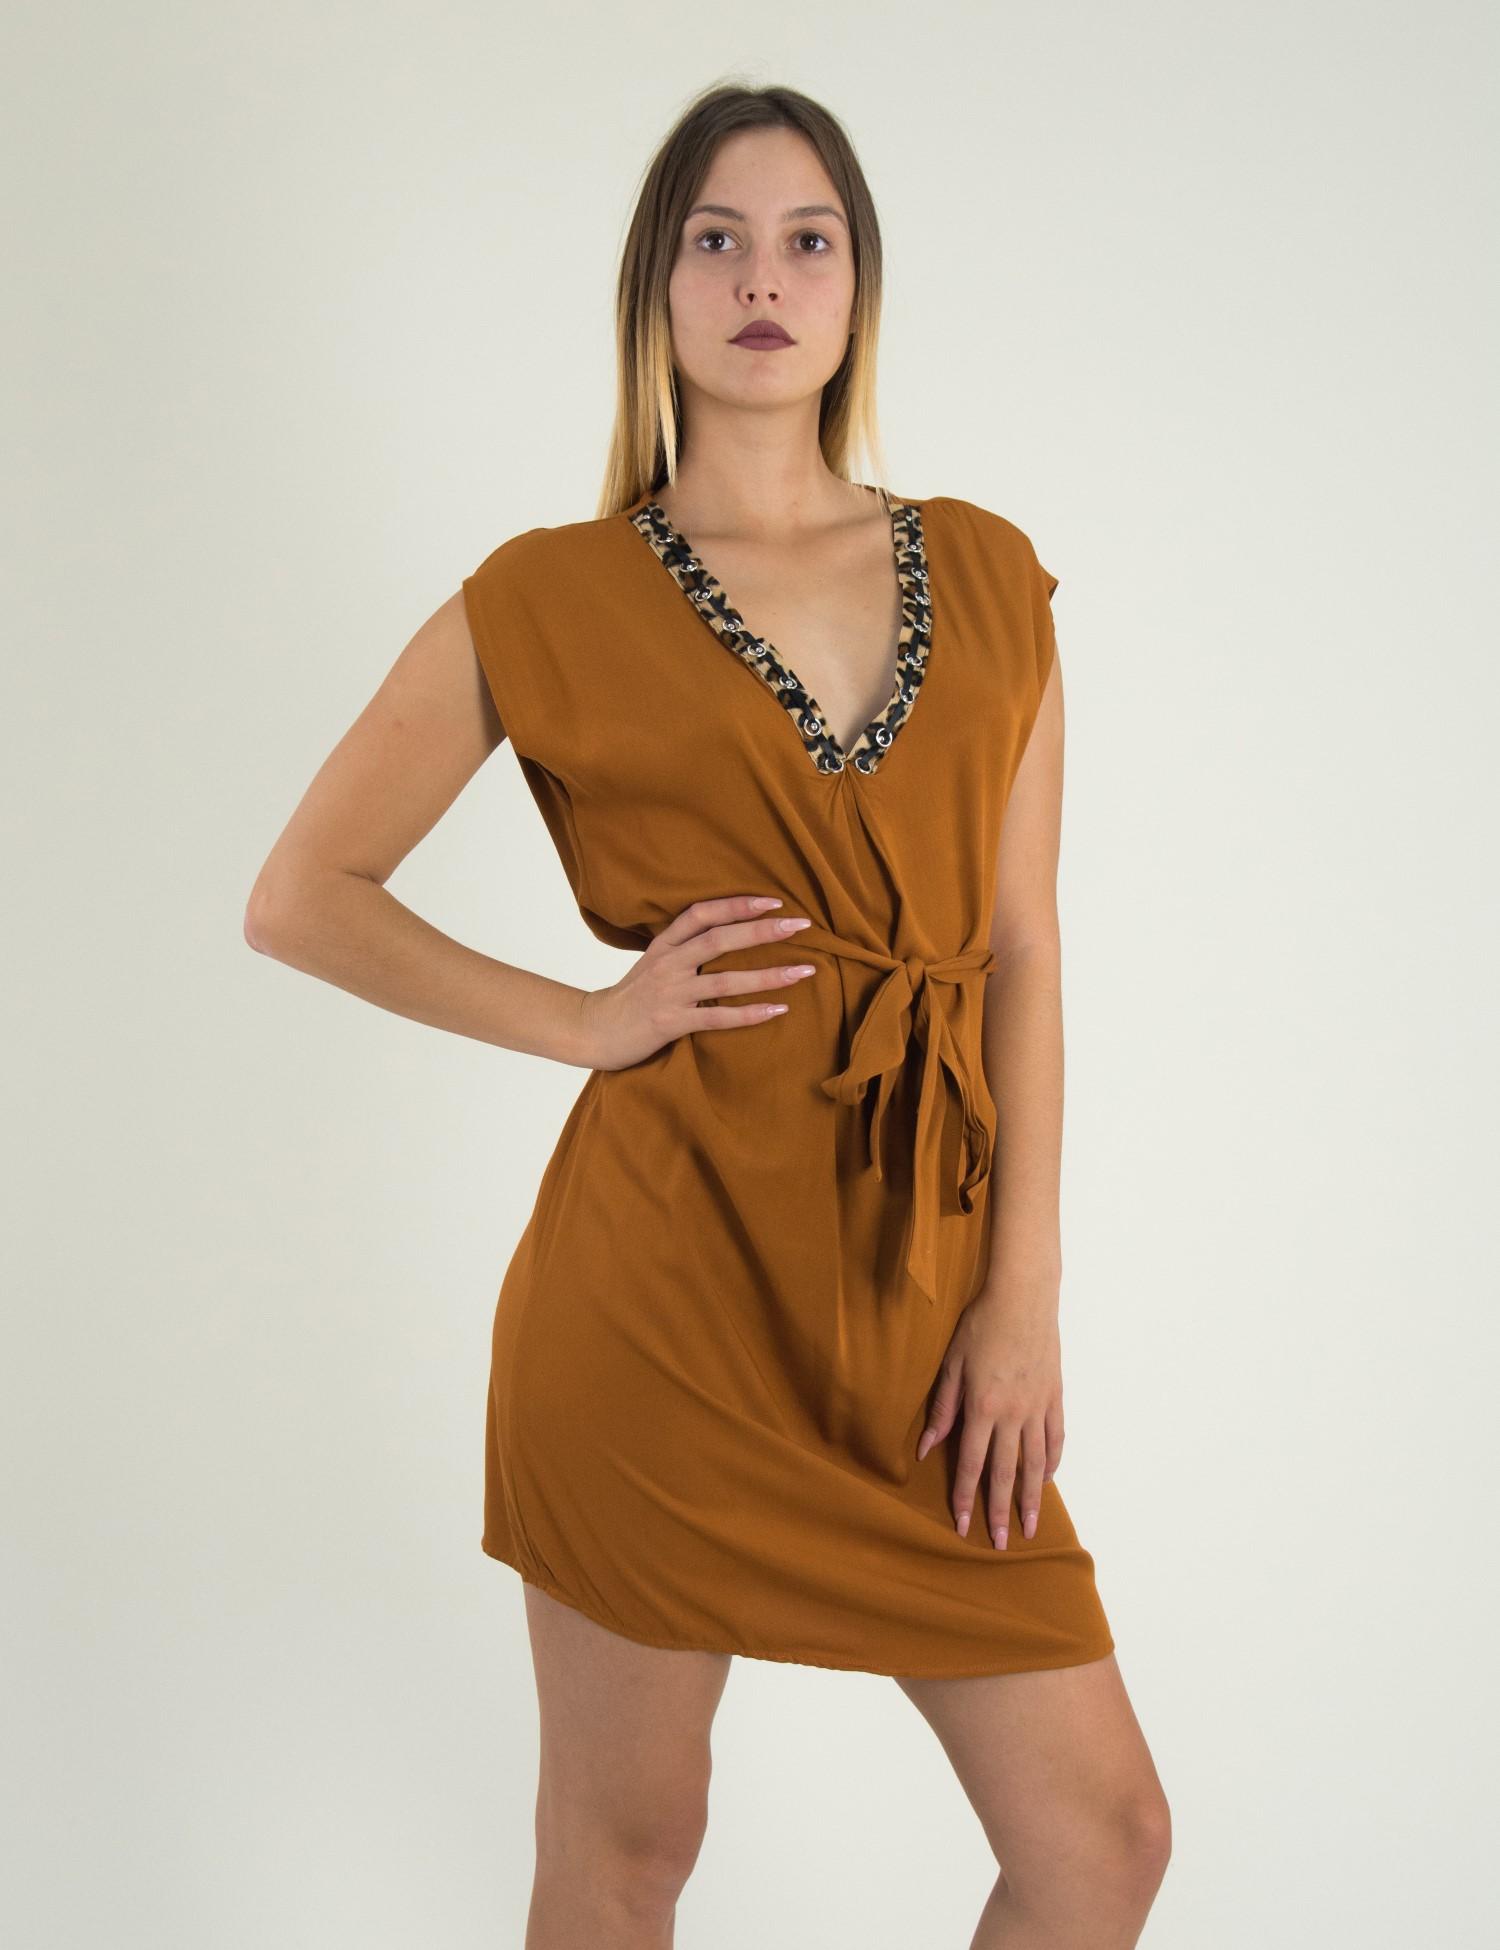 548b94bd8d7f Γυναικείο κάμελ αμάνικο φόρεμα με λεοπάρ σχέδιο 1175824G